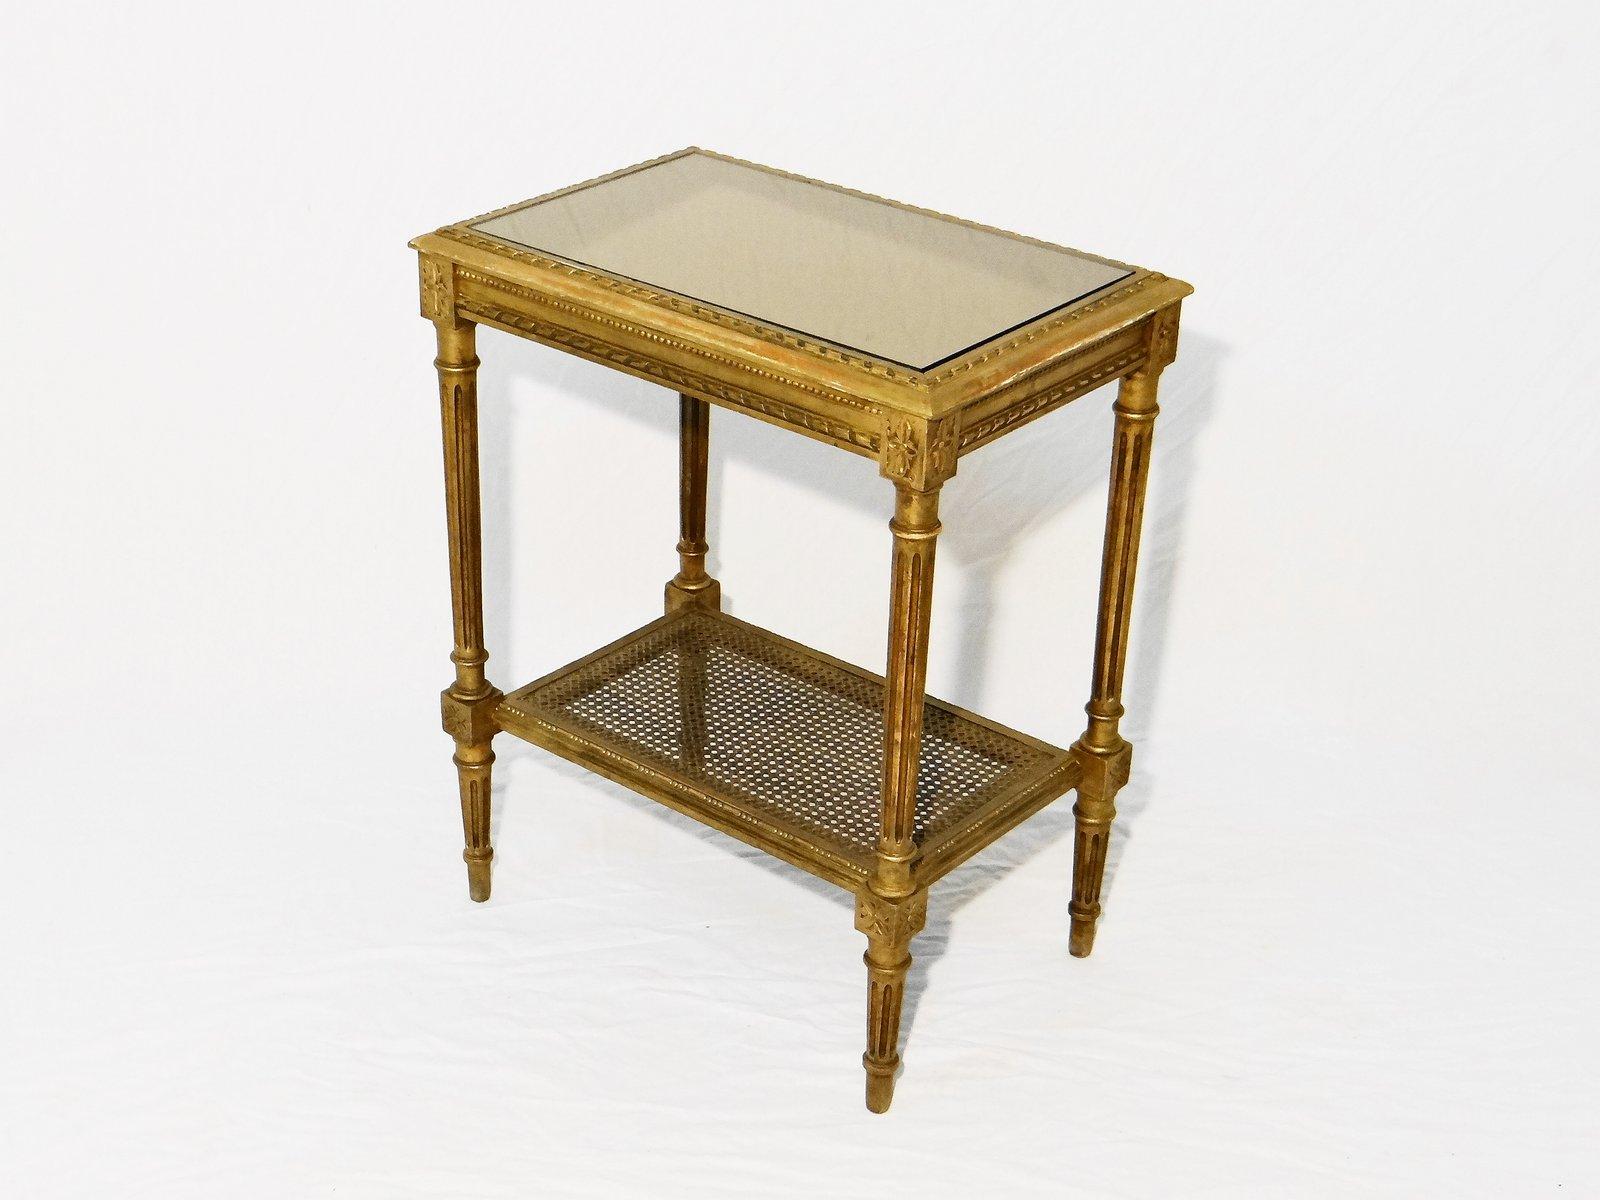 table d 39 appoint en bois dor 1950s en vente sur pamono. Black Bedroom Furniture Sets. Home Design Ideas